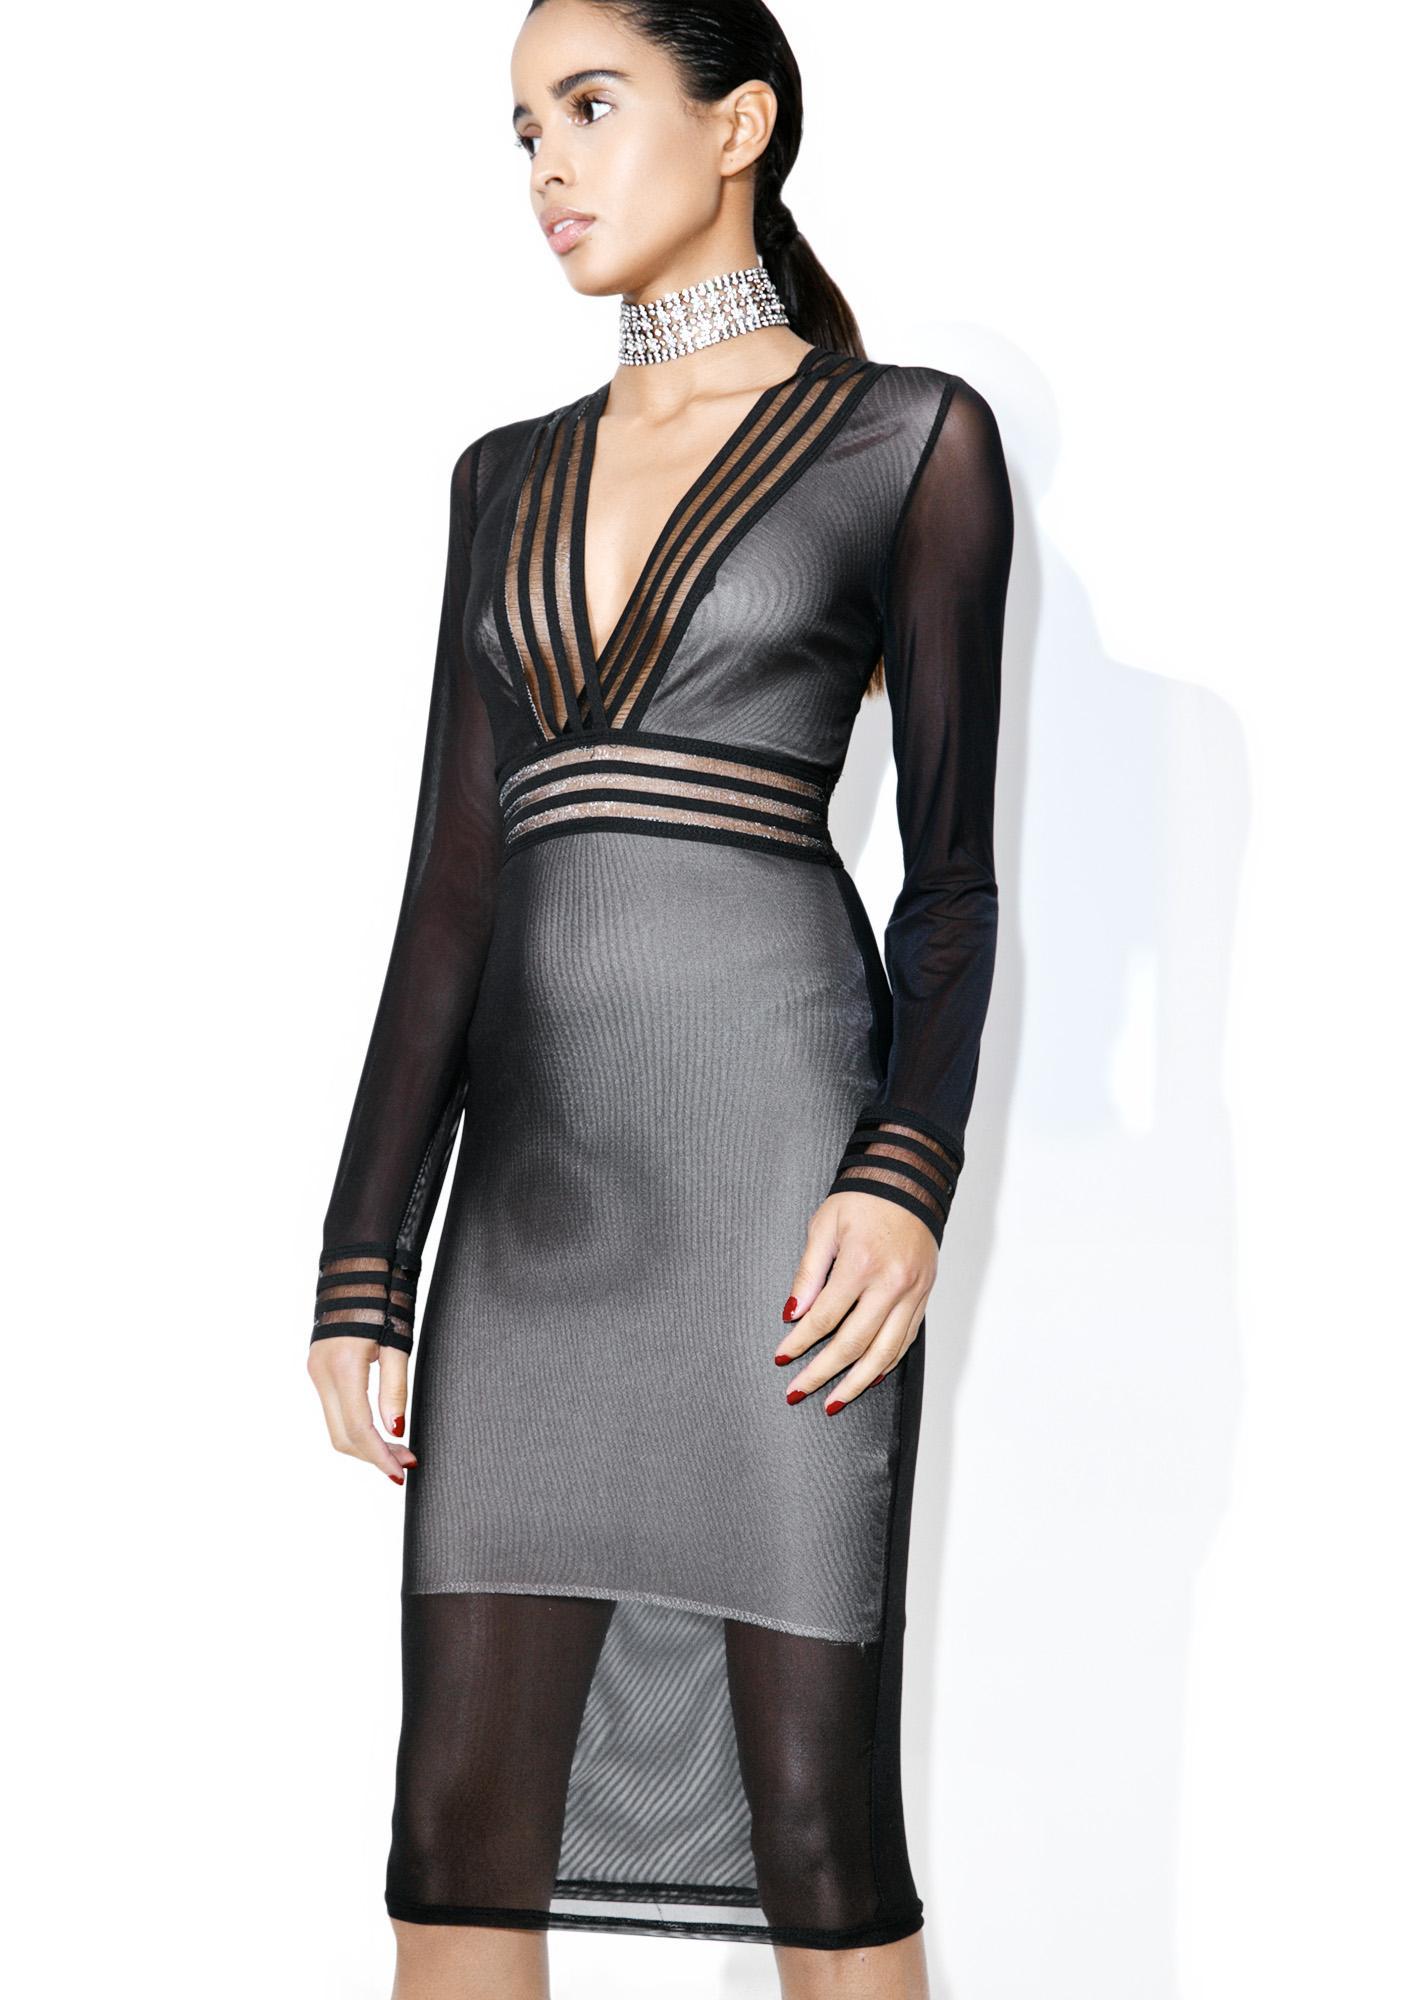 Countdown Sheer Dress